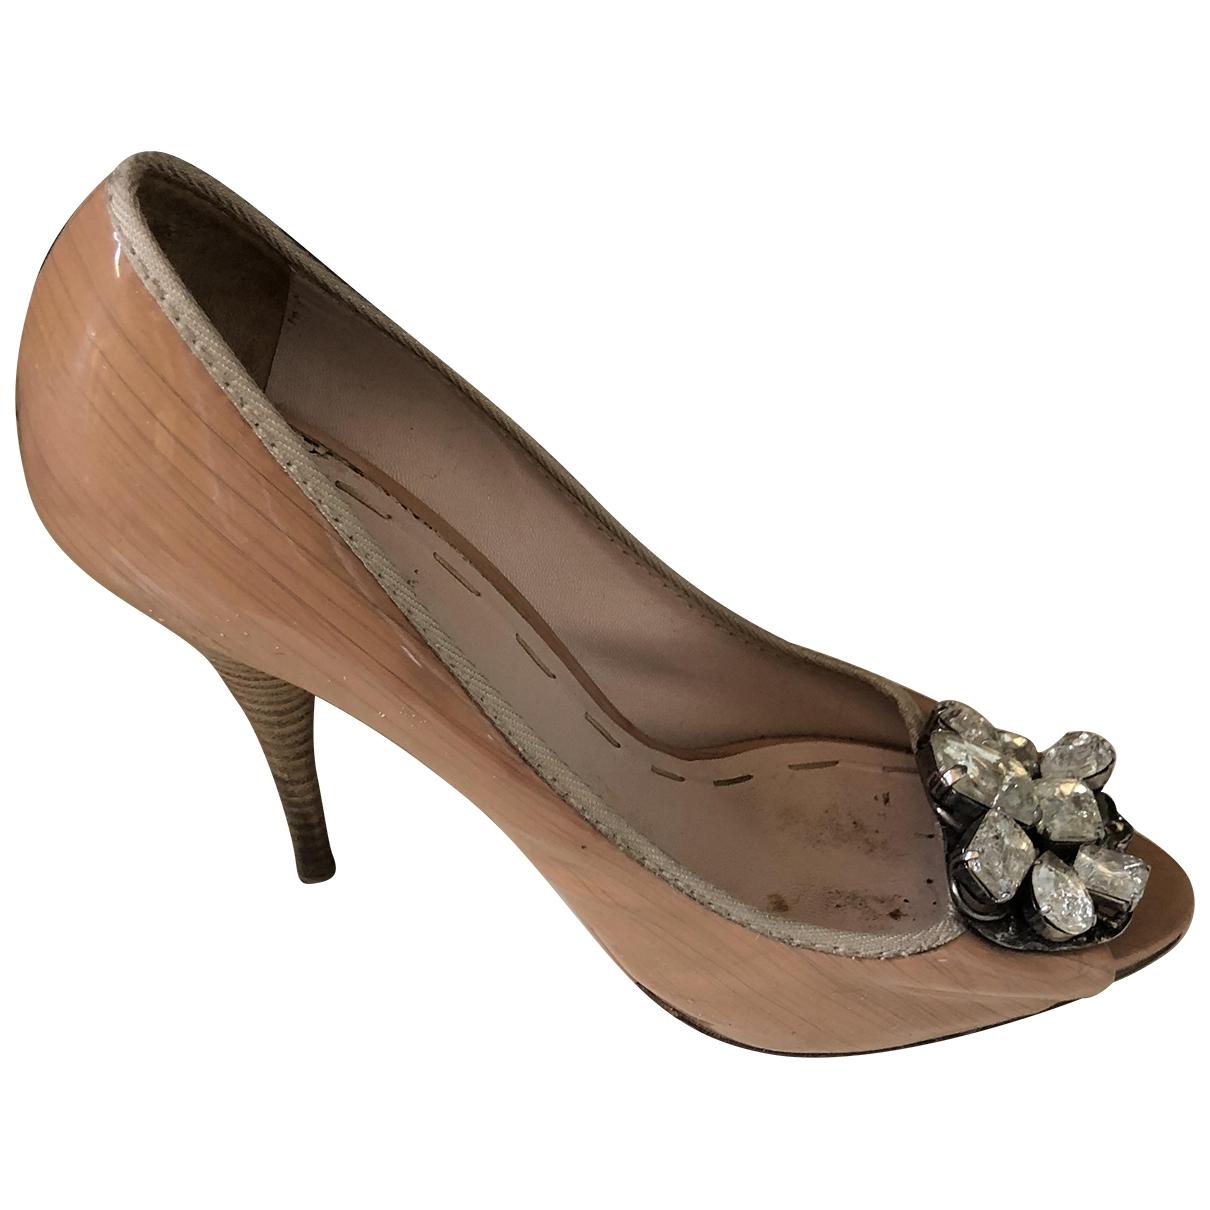 Miu Miu \N Pink Patent leather Heels for Women 40 IT